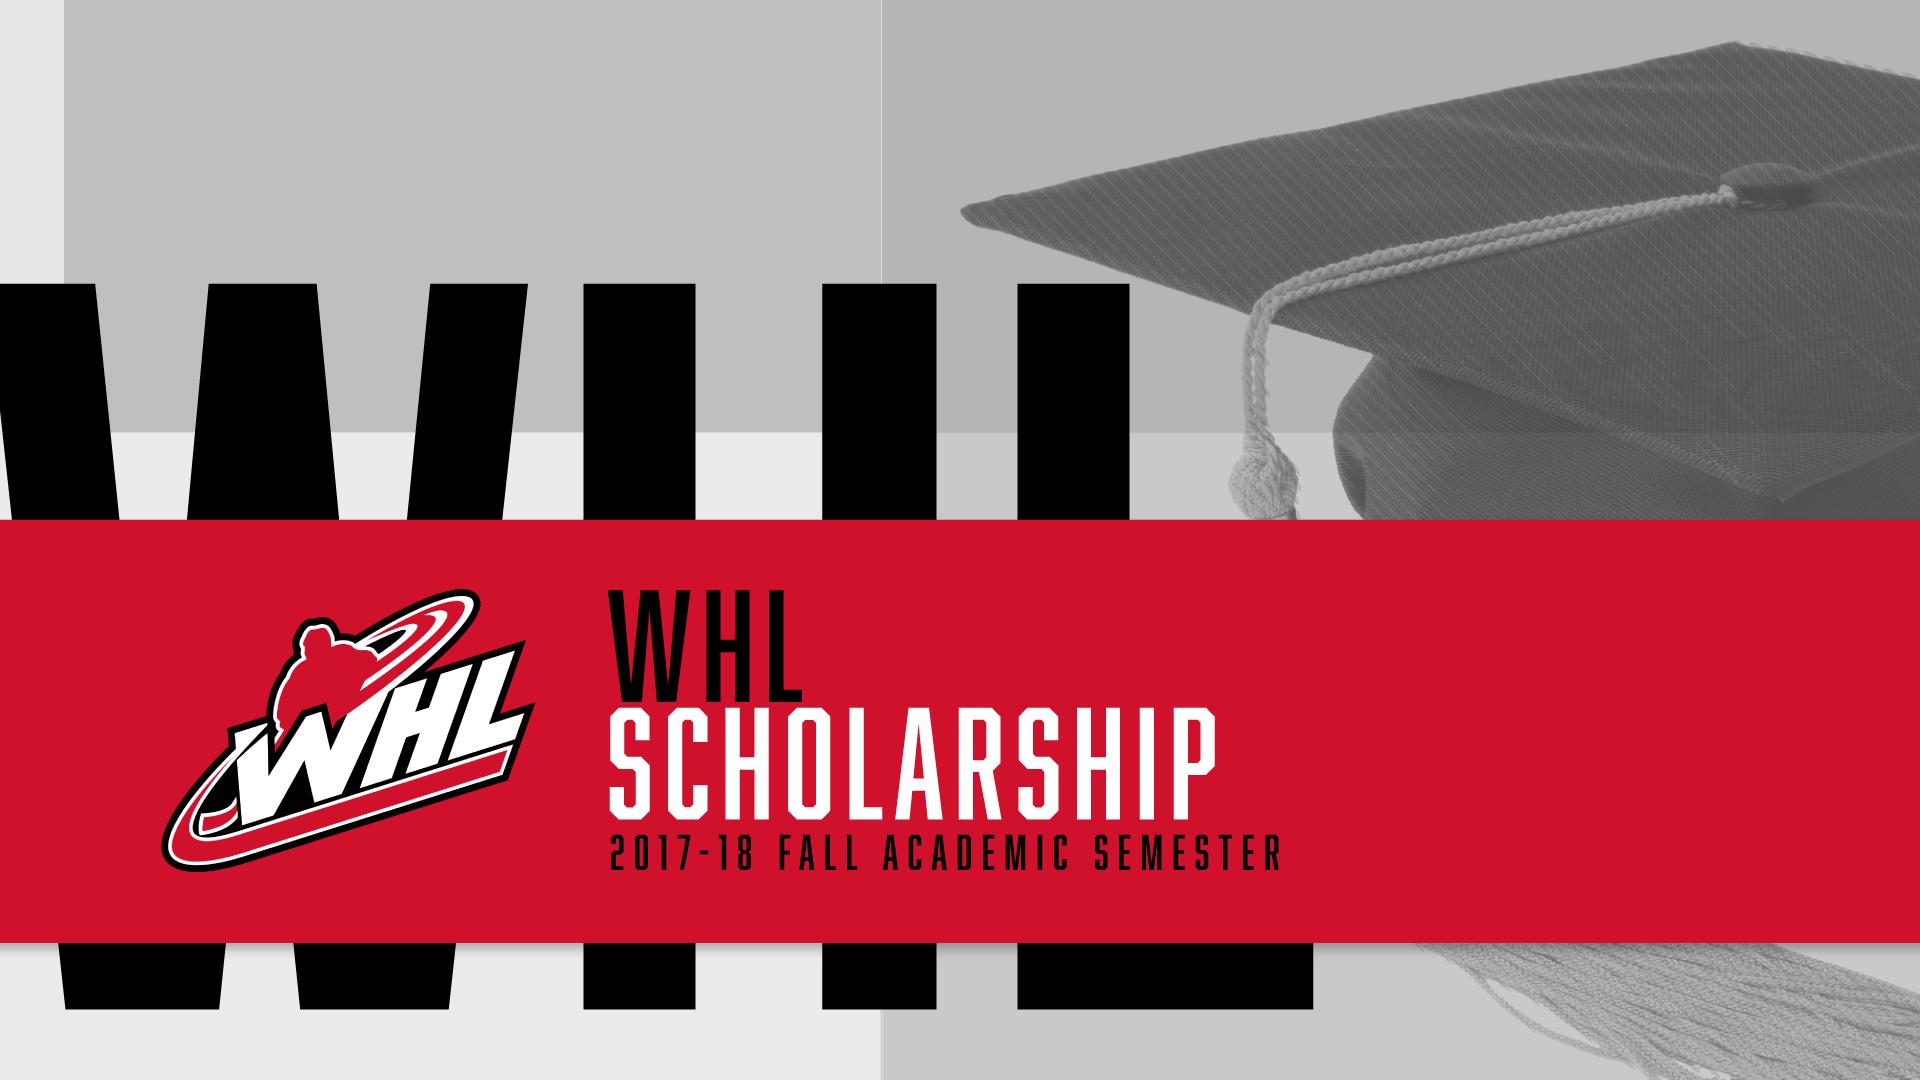 WHL: 18 ICE alumni utilizing WHL scholarship this semester